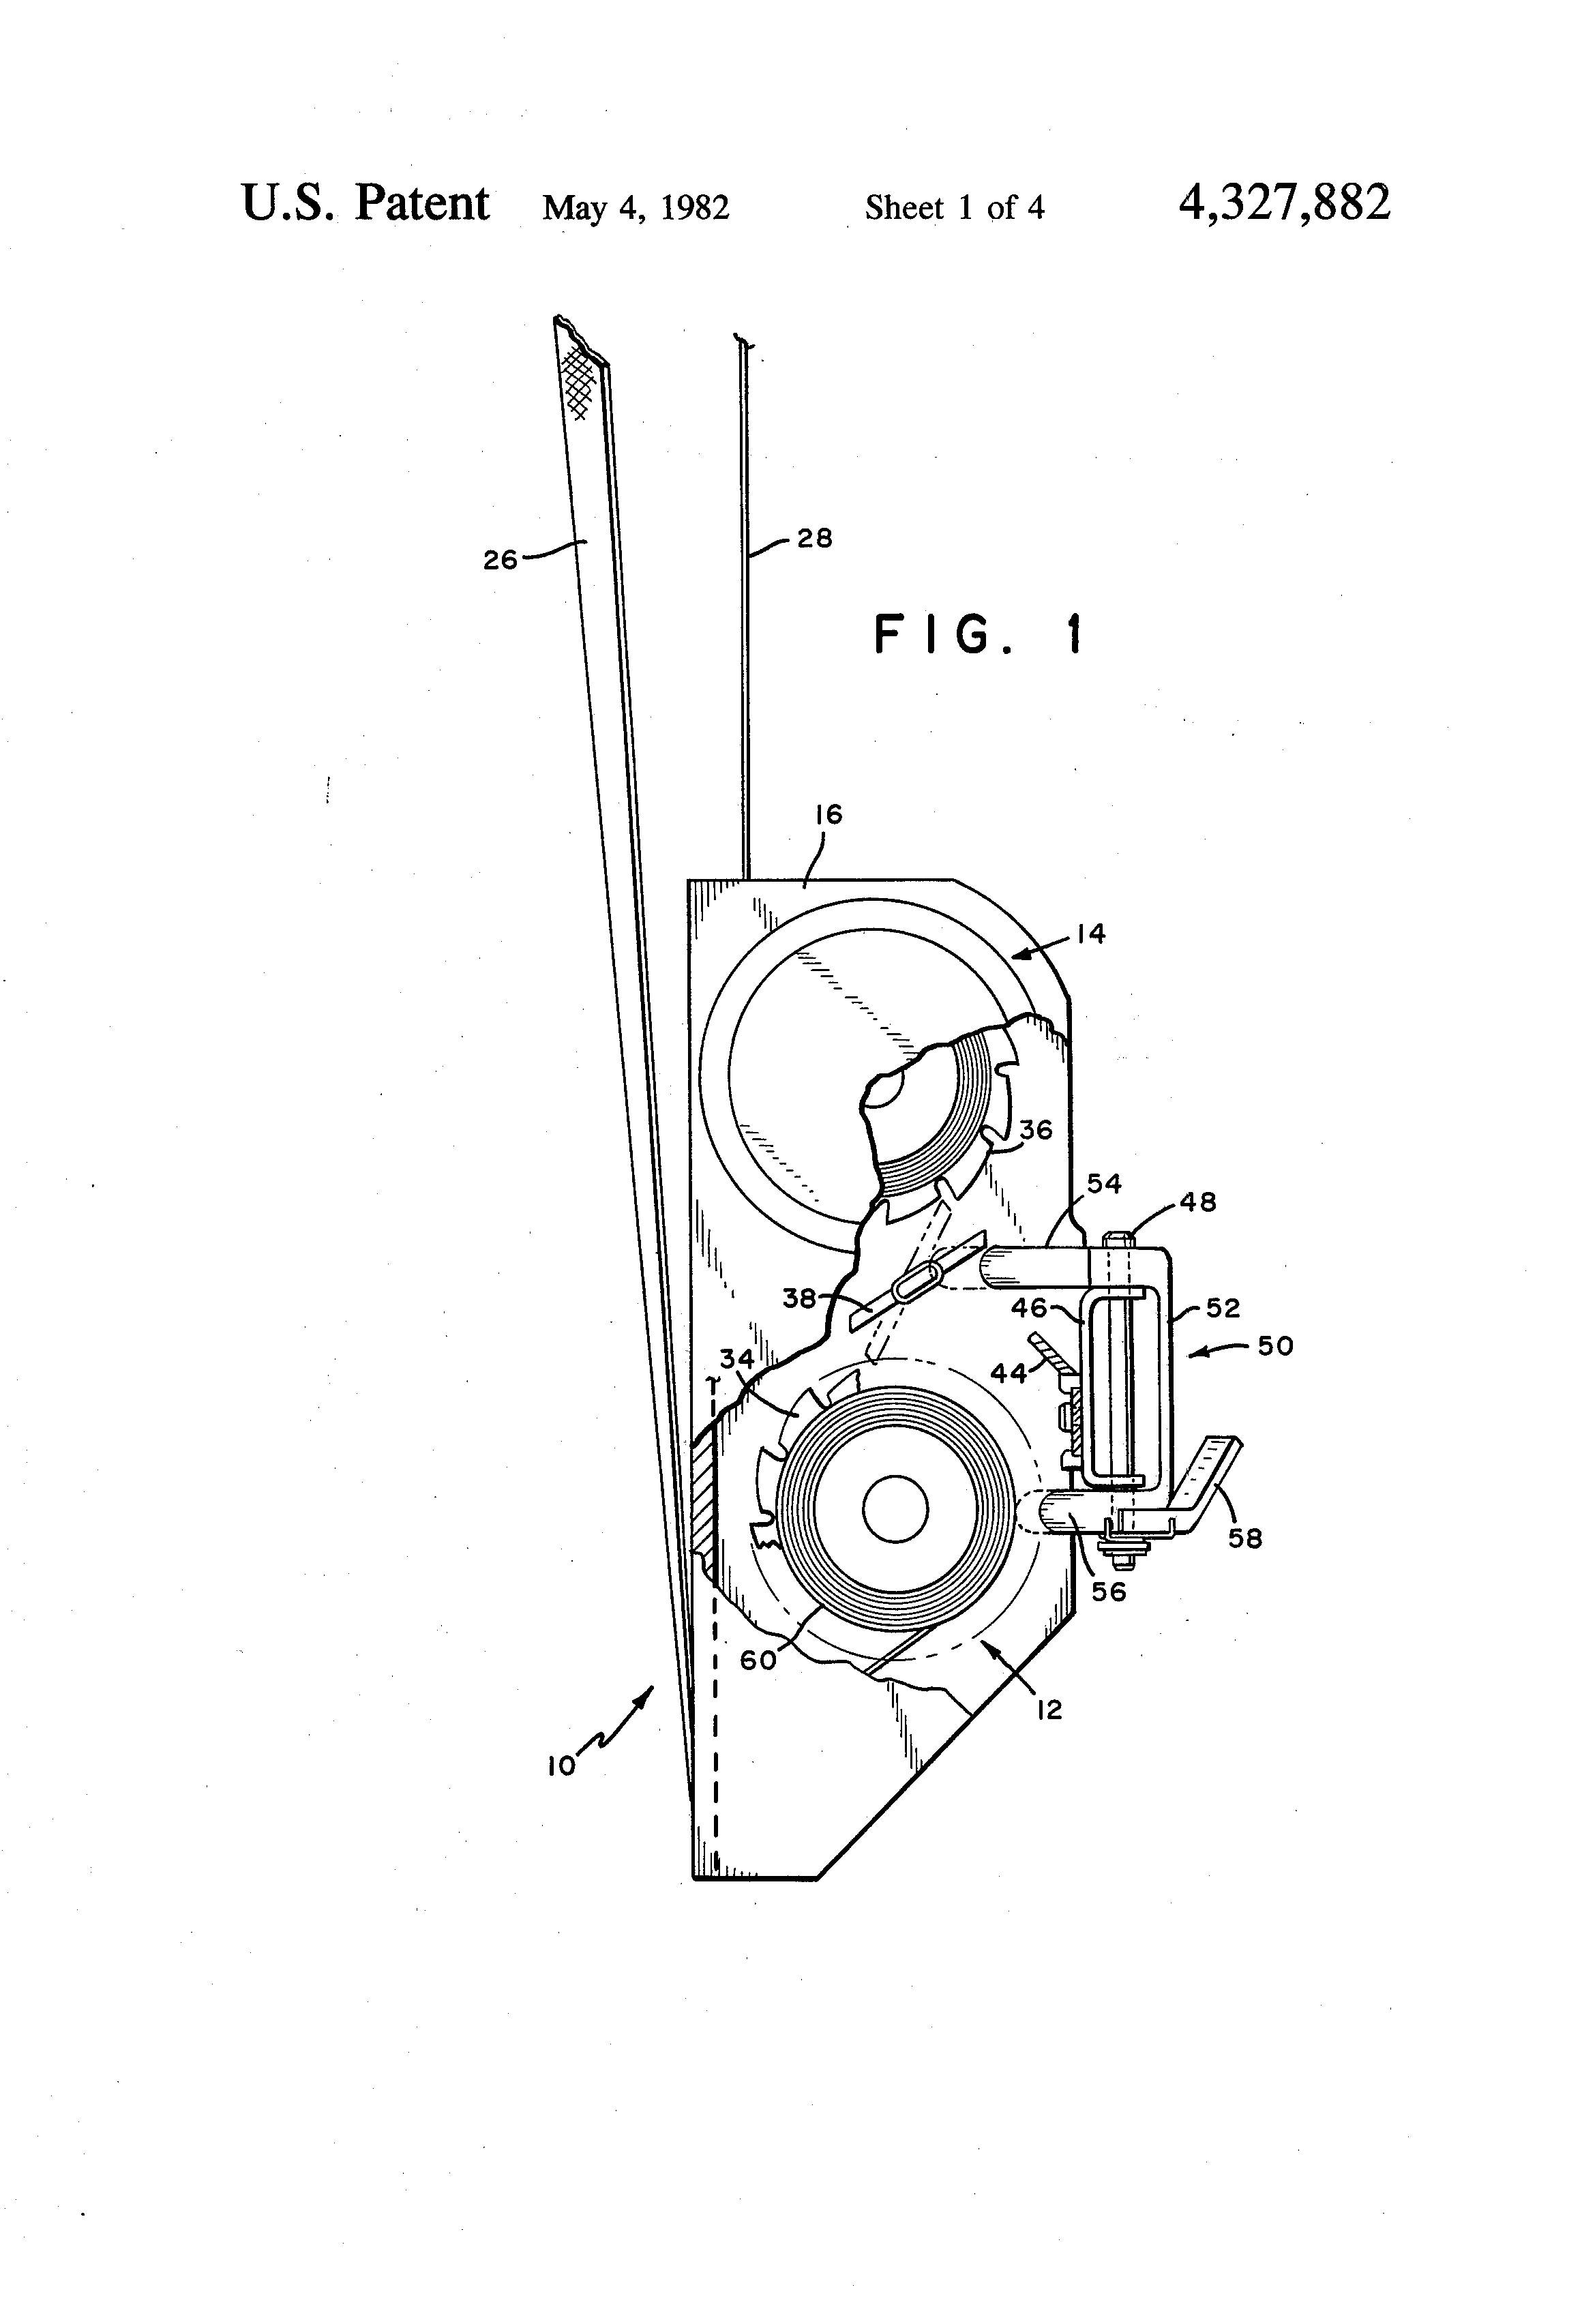 seat belt diagram google wiring diagram category seat belt diagram google [ 2320 x 3408 Pixel ]